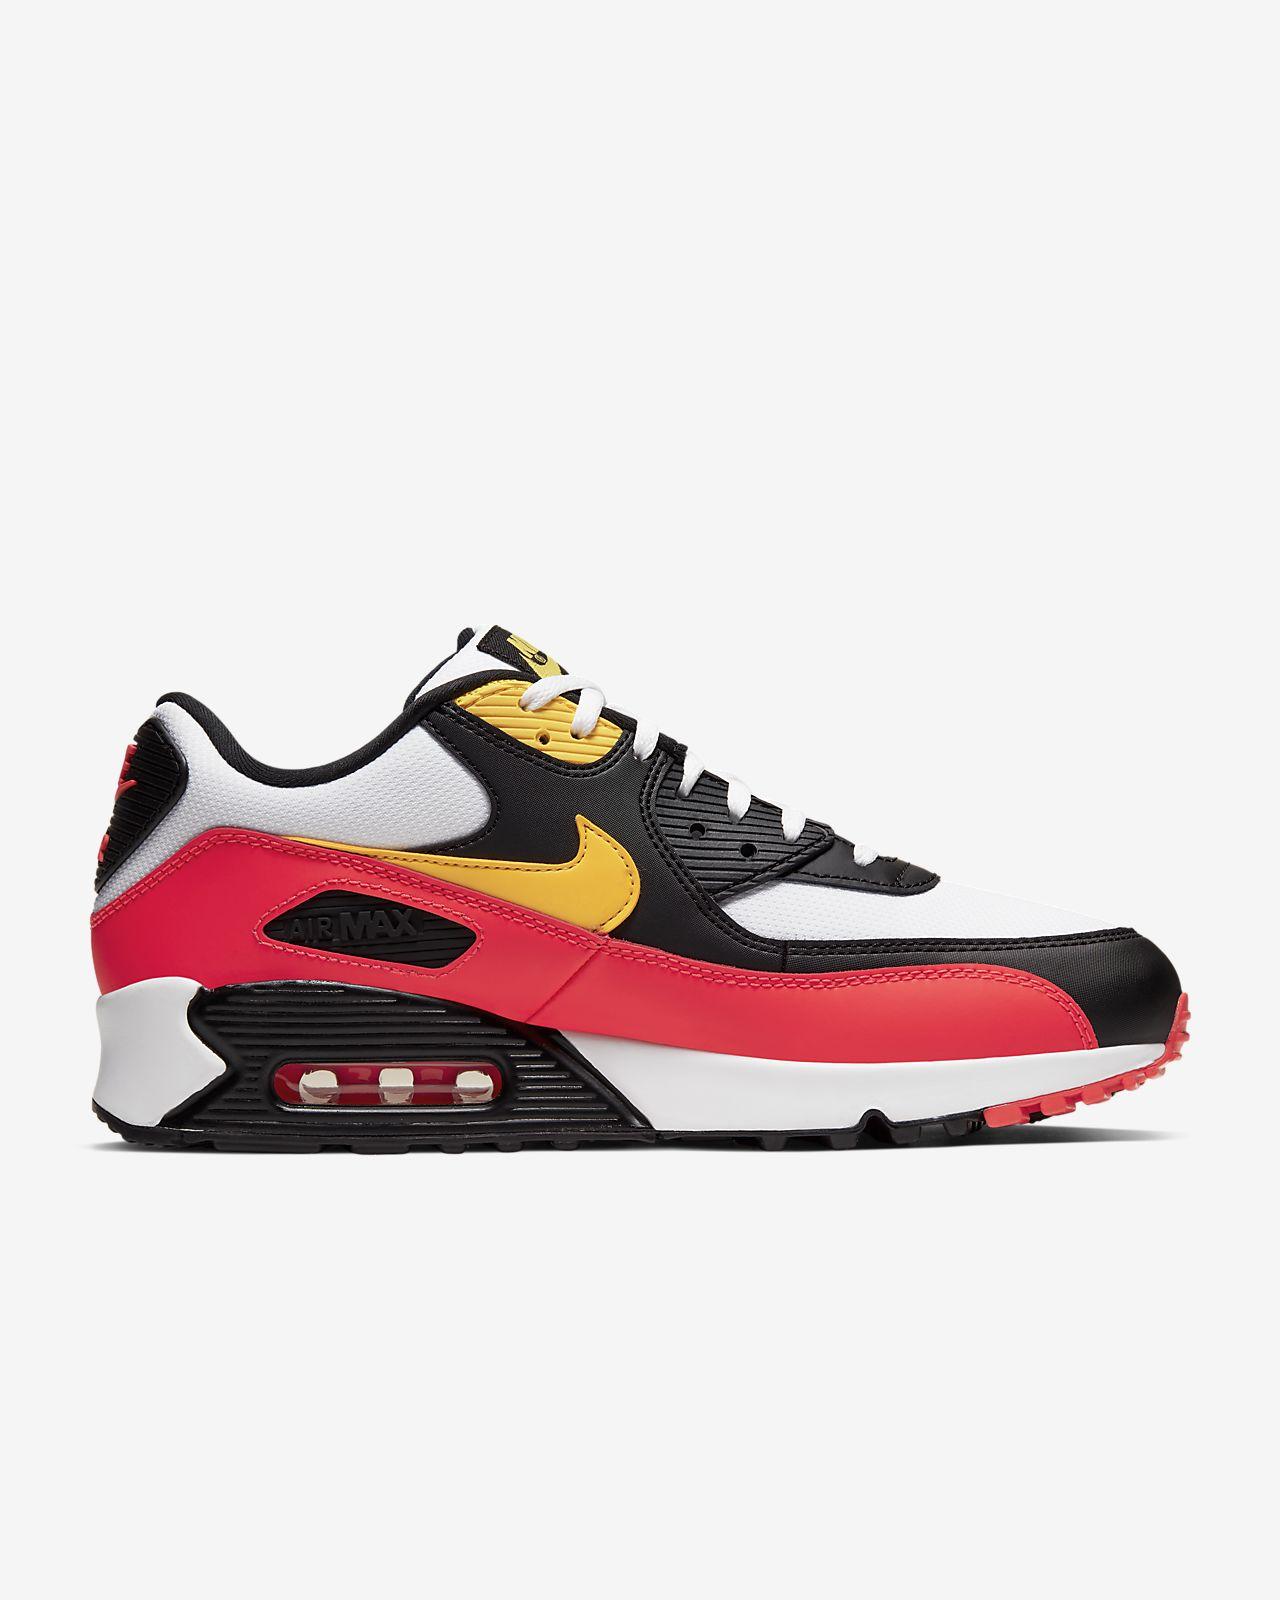 Nike Air Max 90 Mens : Shop Latest Cheap Nike Shoes For